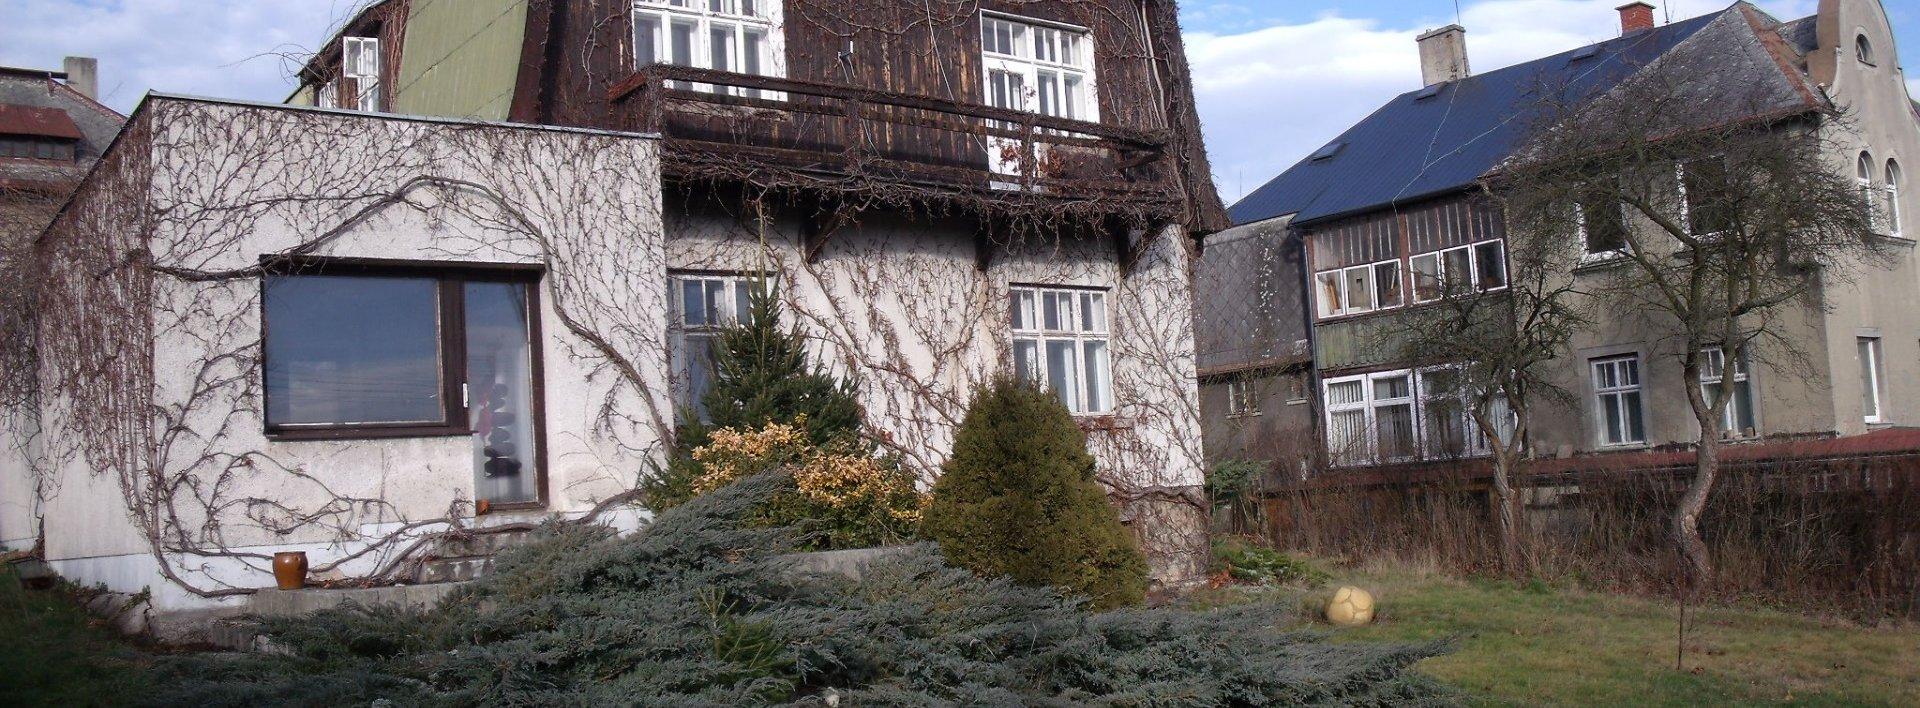 Prodej hezkého rodinného domu v Liberci - Růžodole, Ev.č.: N48968